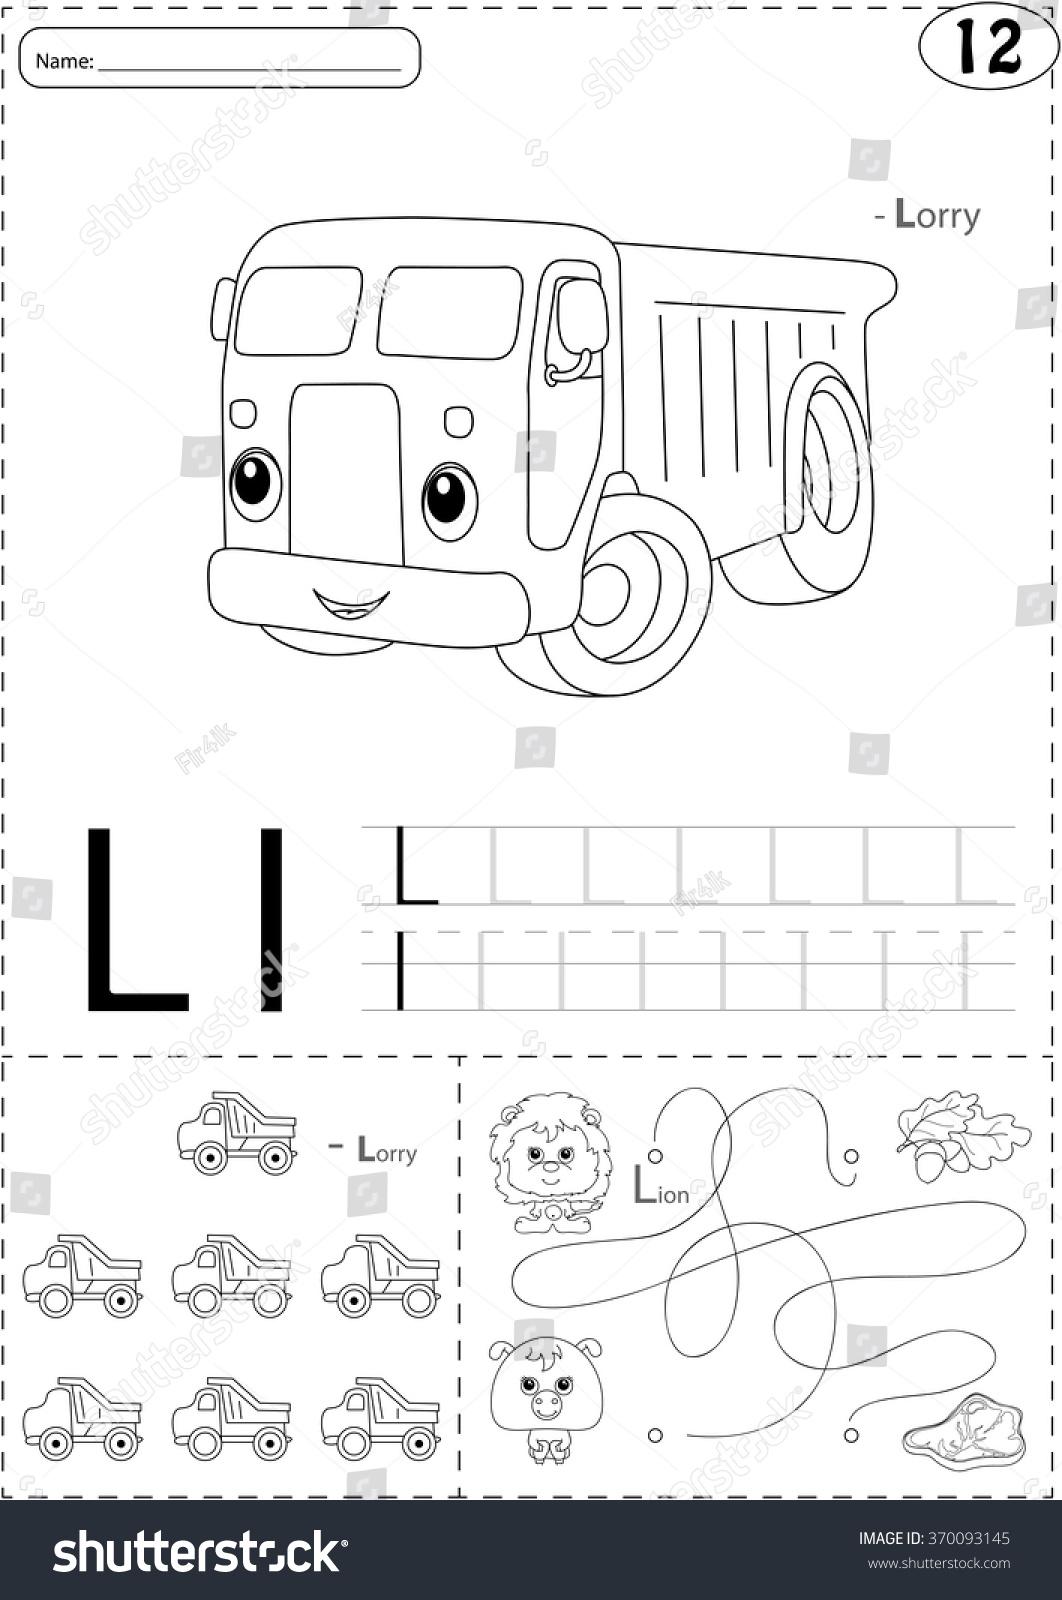 Fire Truck Tracing Worksheet For Preschoolers